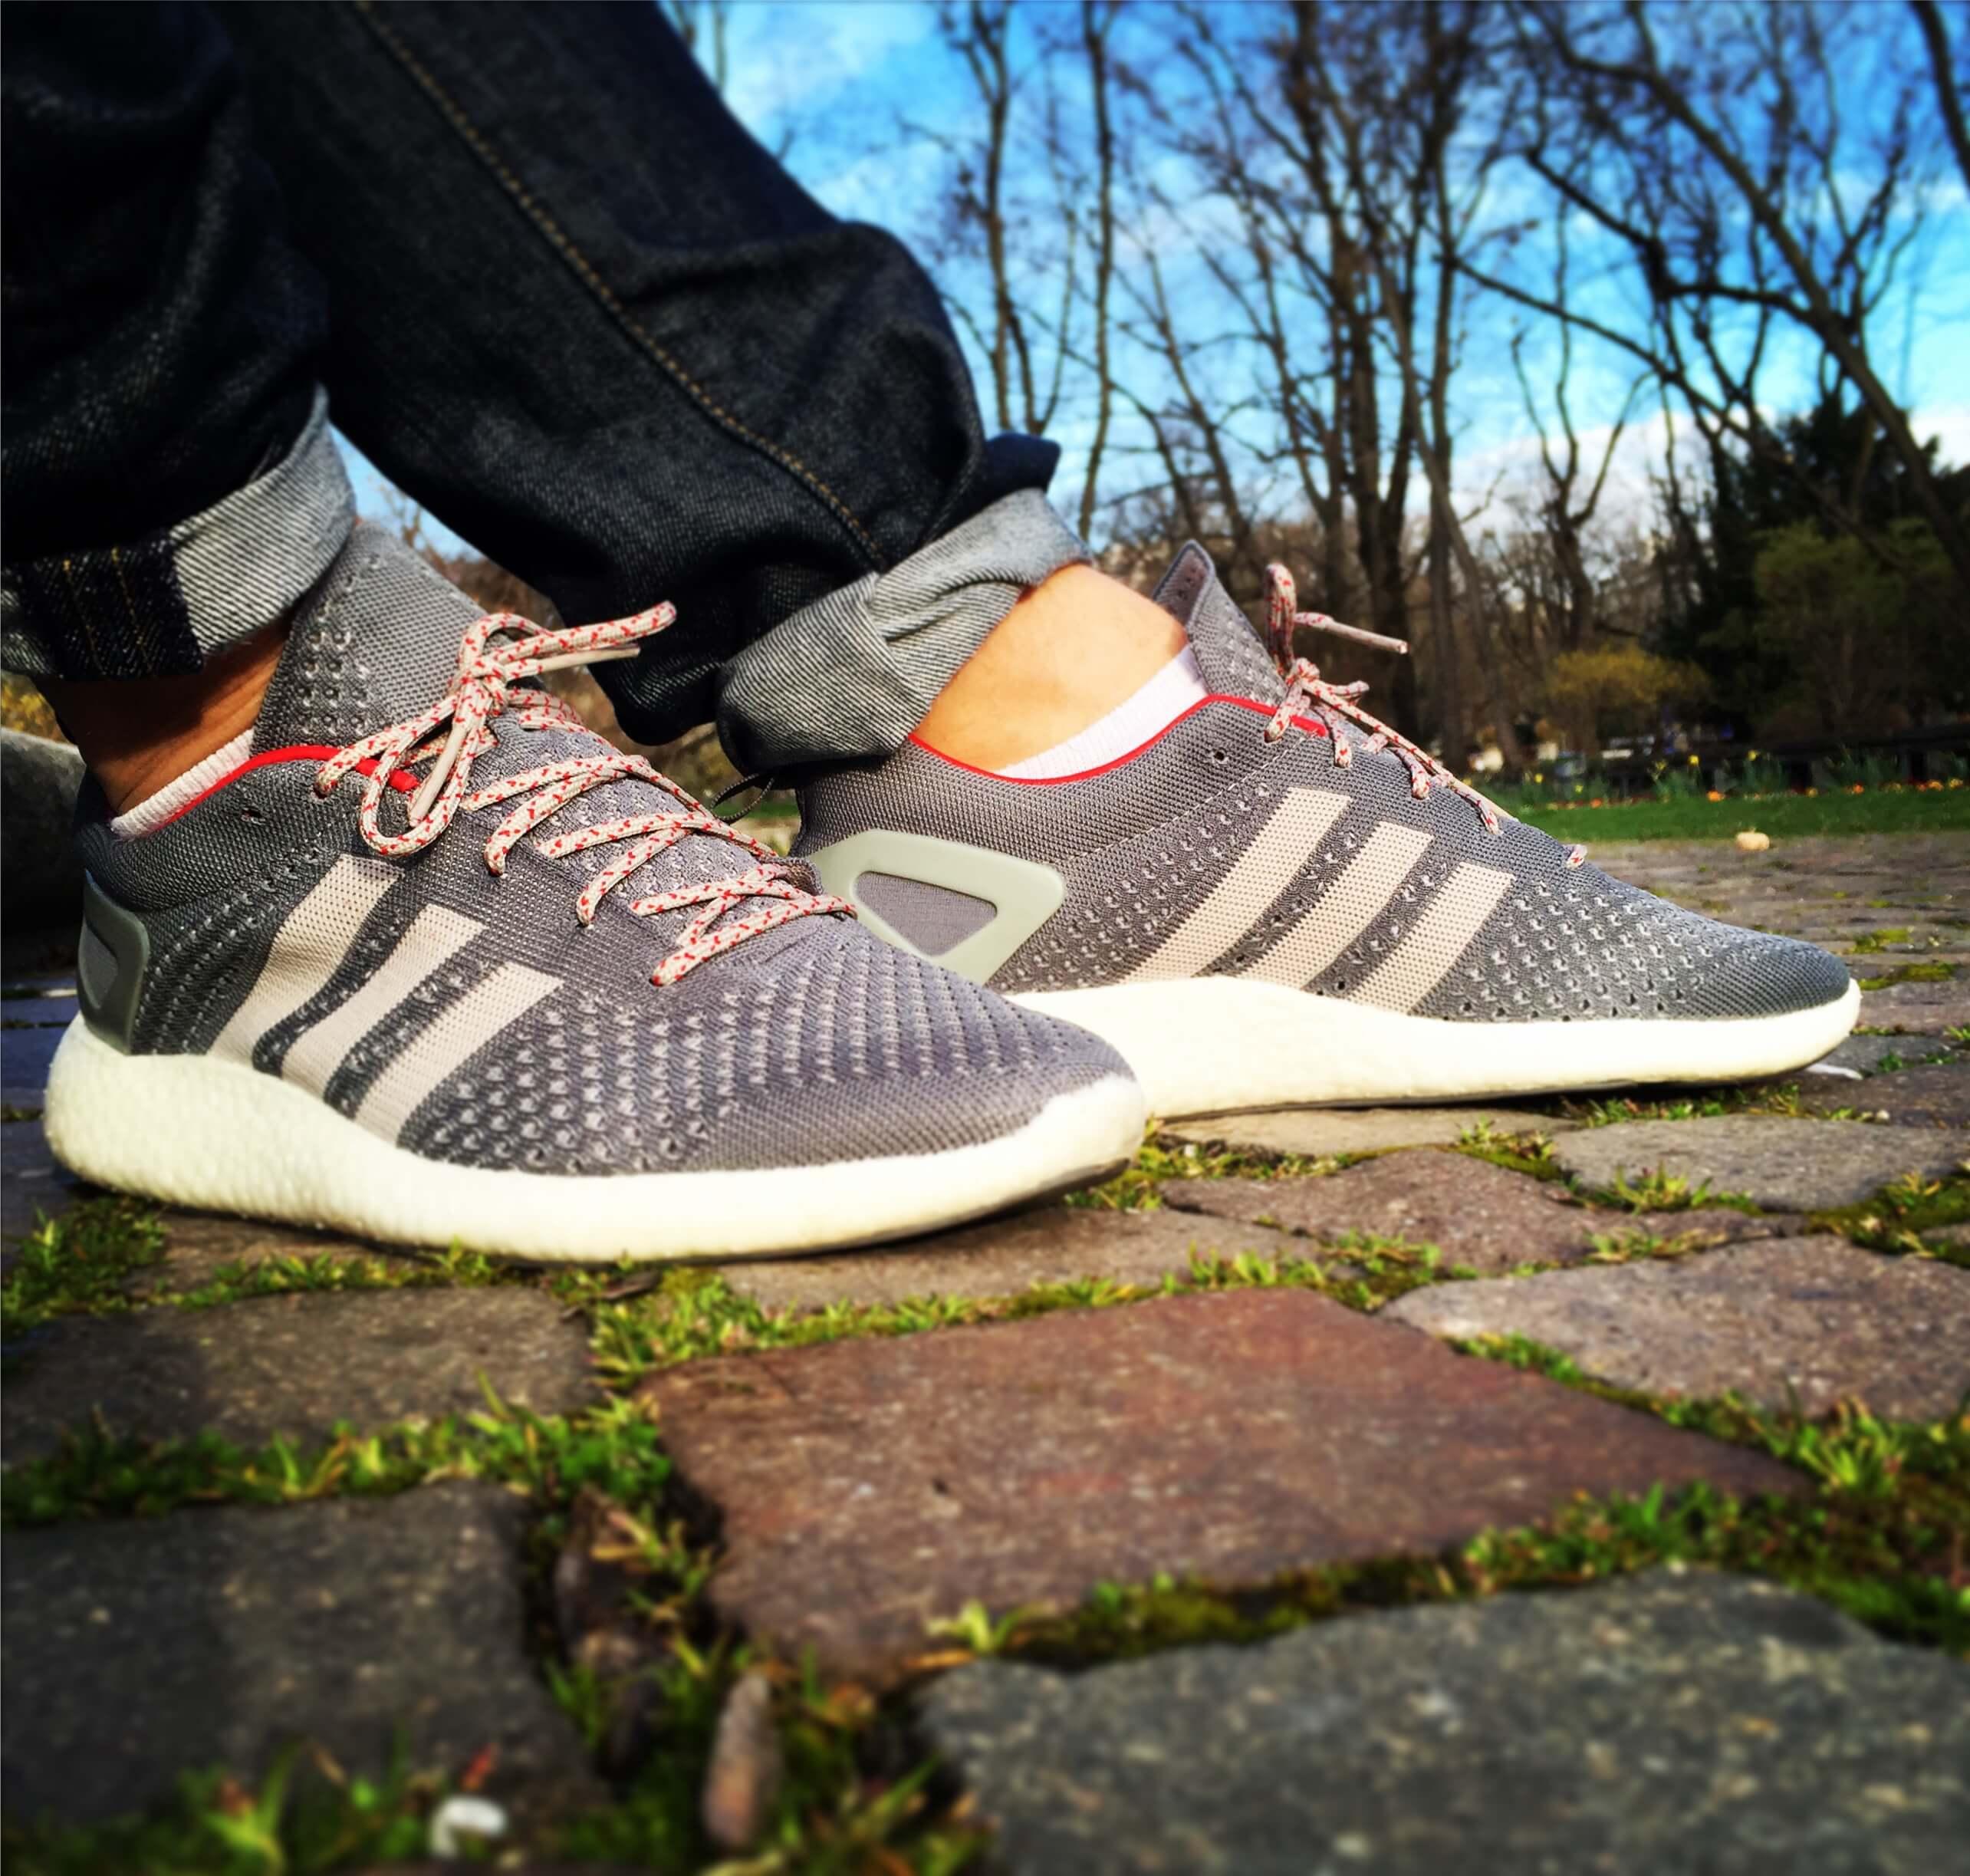 Adidas-Pure-Boost-Primeknit-Side-View-Benstah-Onfeet